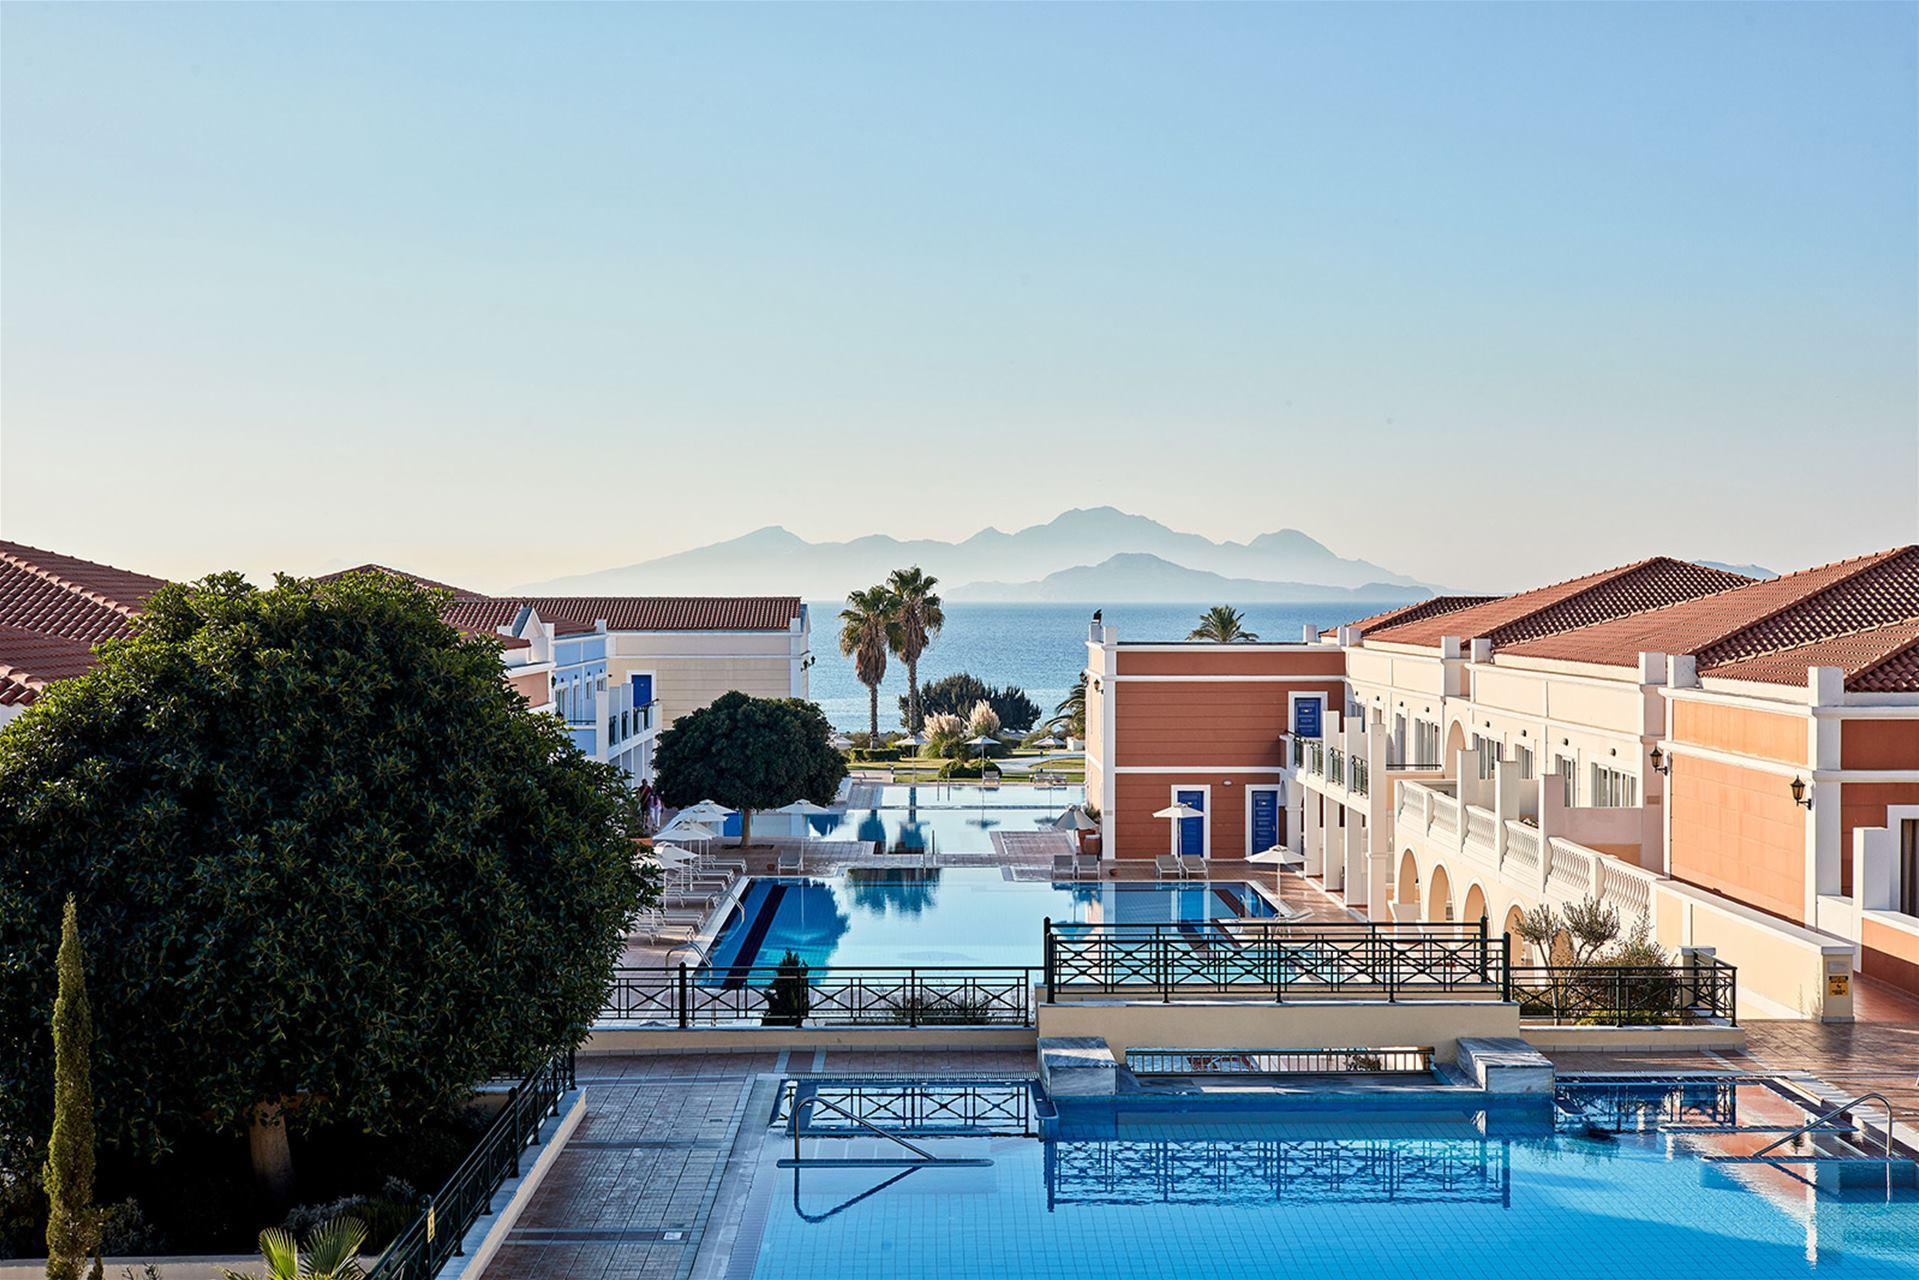 Holidays at Atlantica Porto Bello Royal Hotel in Kardamena, Kos